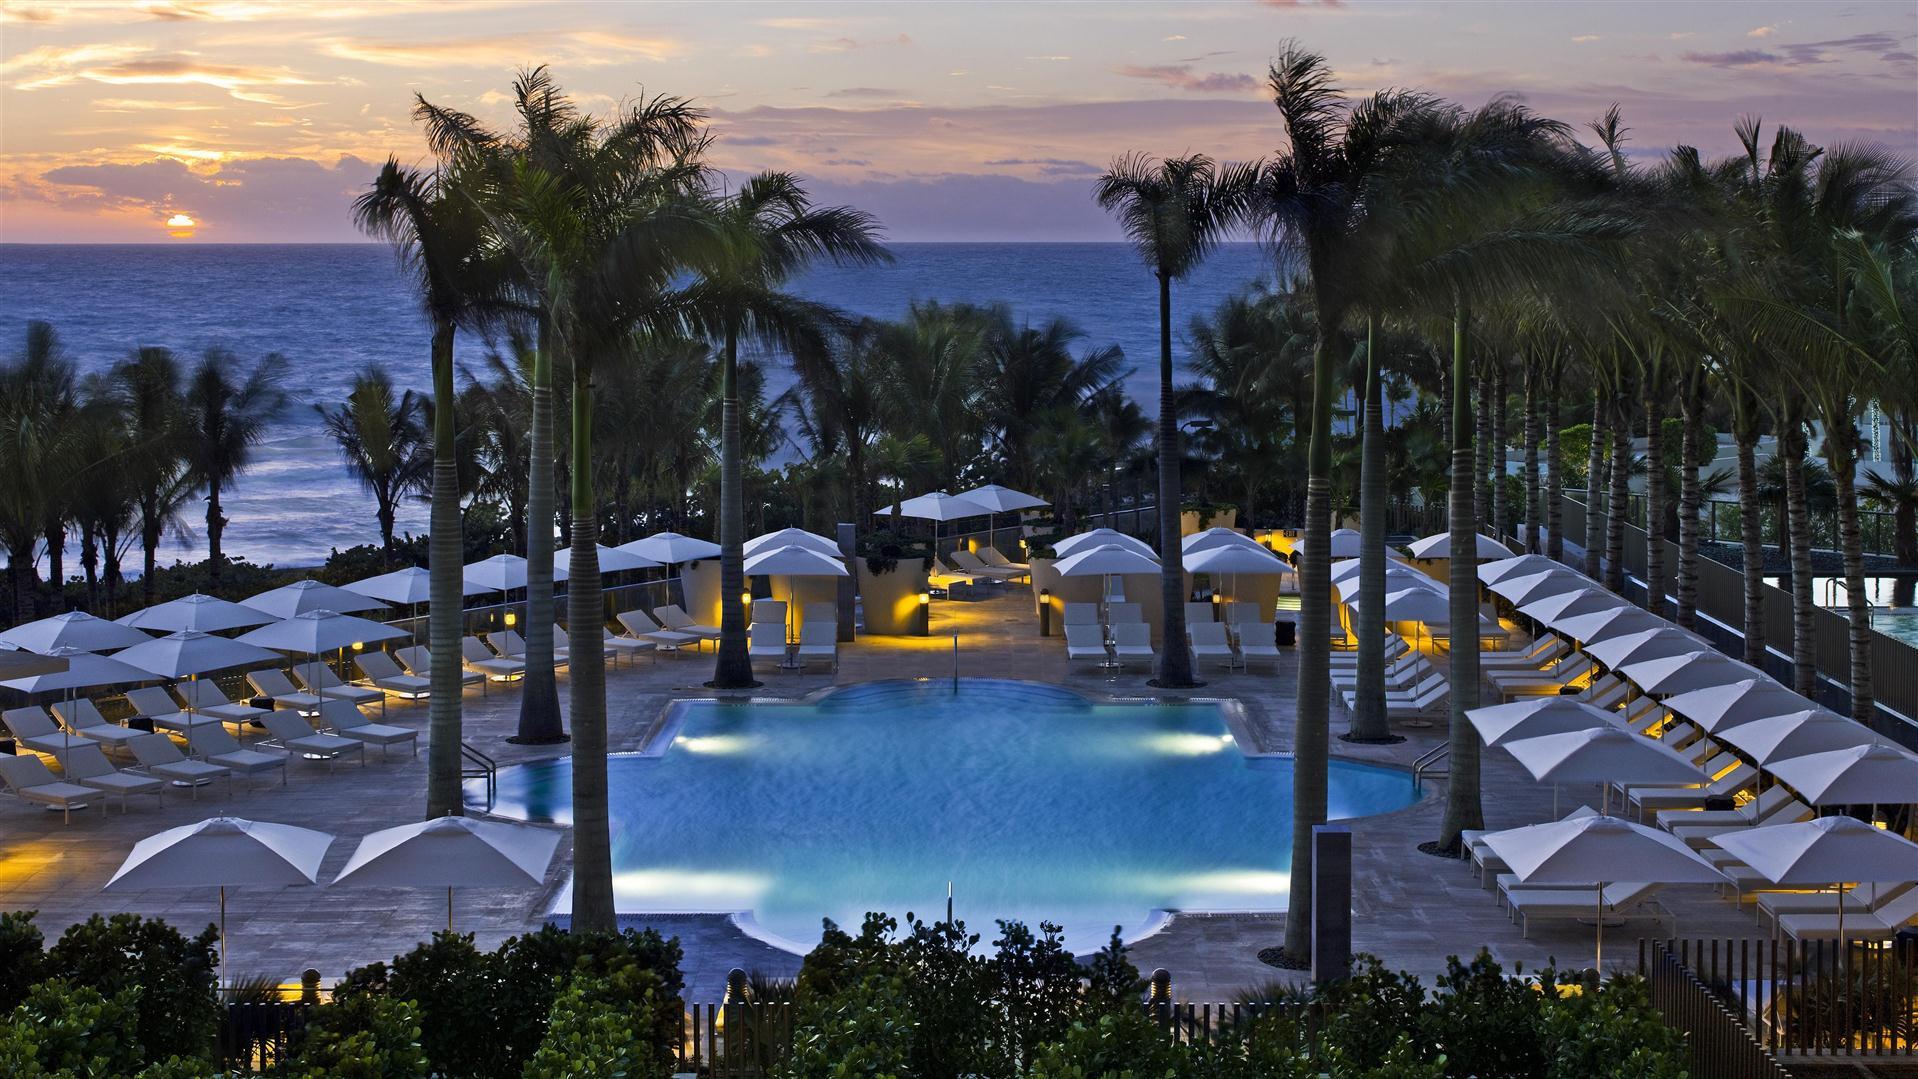 Luxury Travels – Discover Miami luxury travels Luxury Travels – Discover Miami Luxury Travels Discover Miami 10